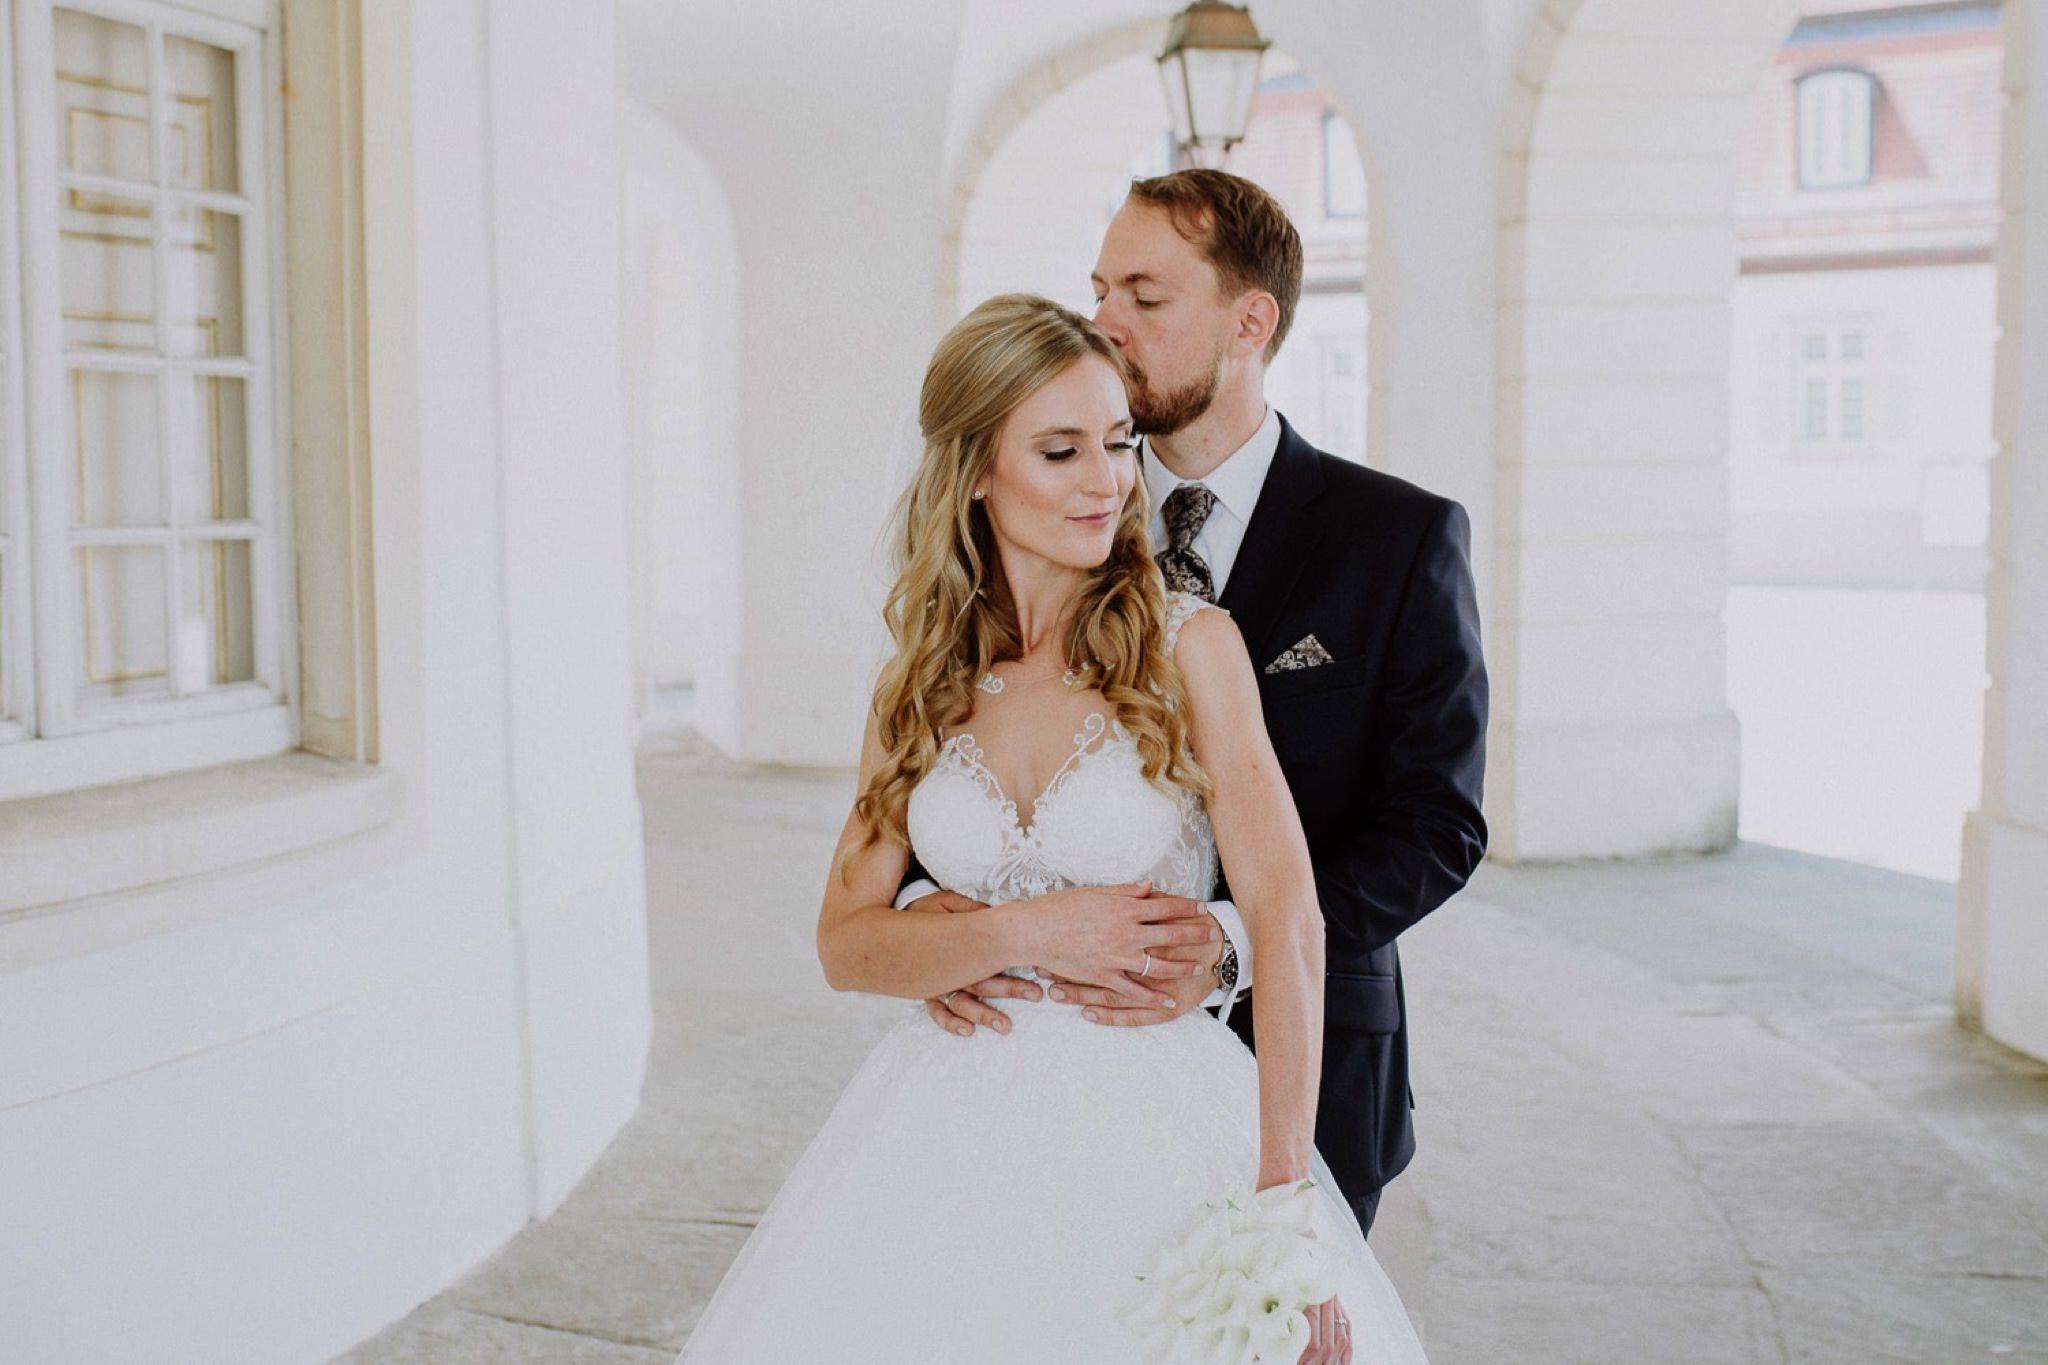 wedding photographer hamilton new zealand 1018 2